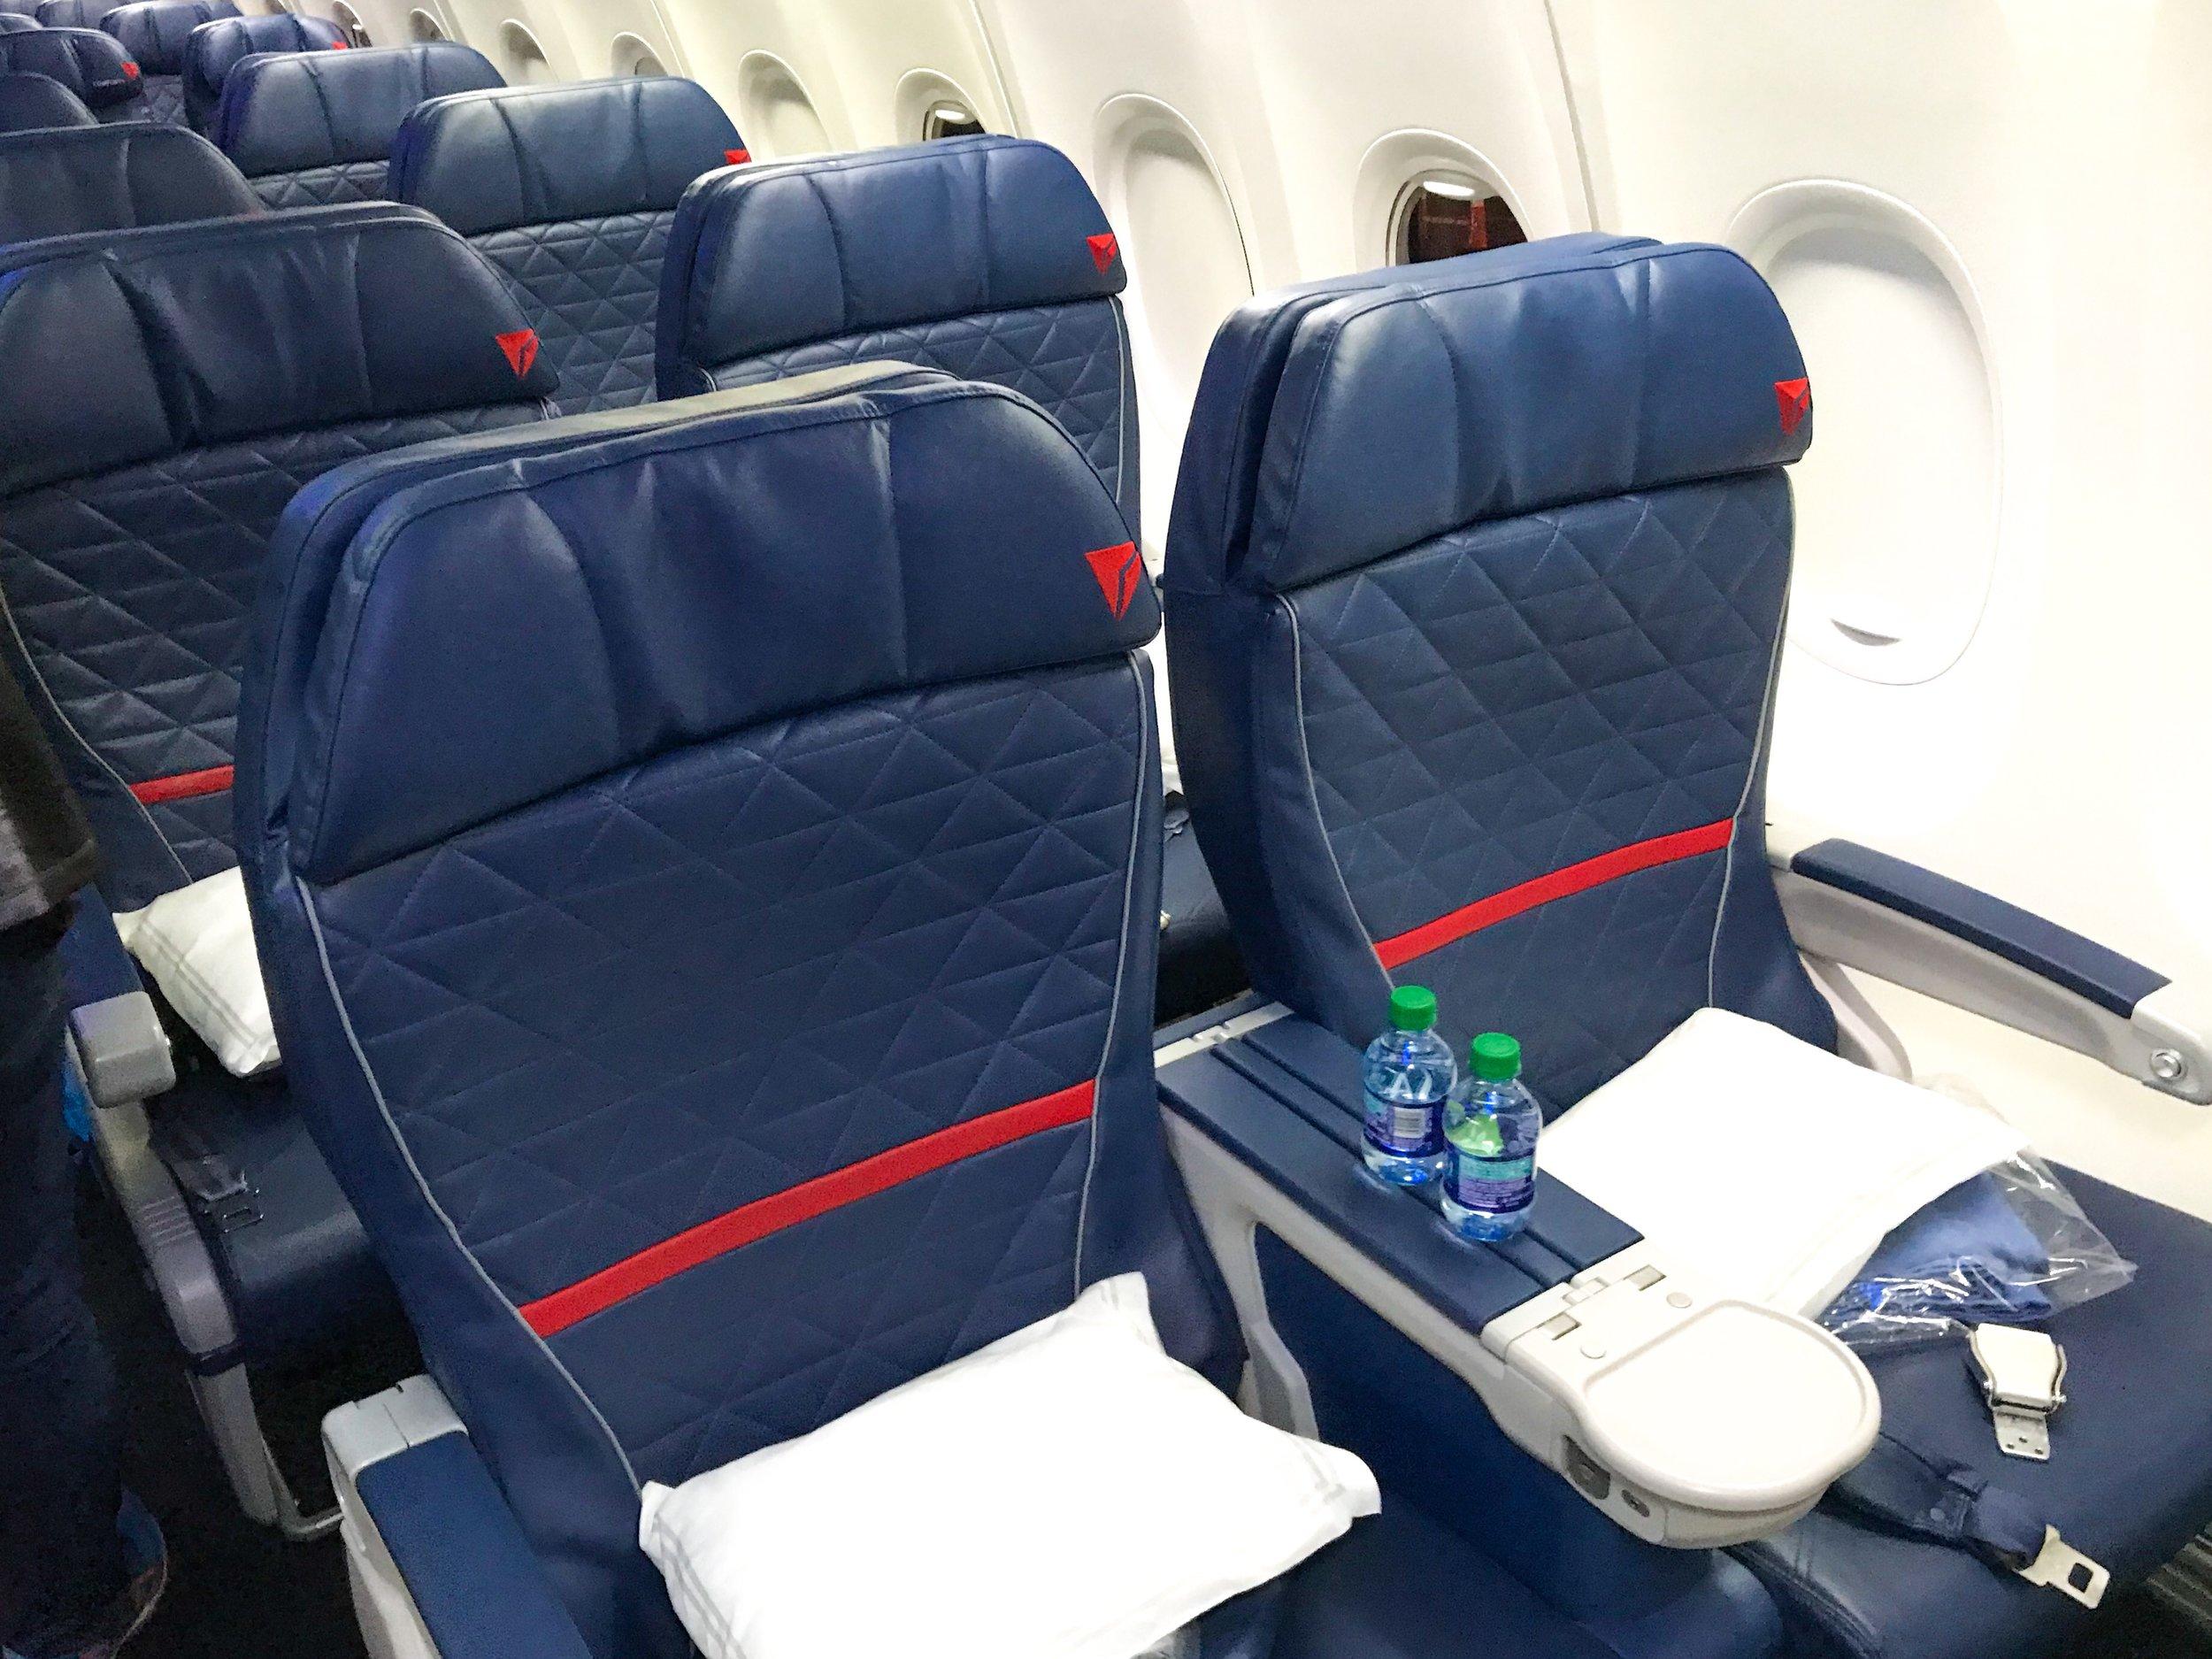 MODIFIED AIRCRAFT - First Class:16 SeatsDelta Comfort+:36 SeatsMain Cabin:108 Seats